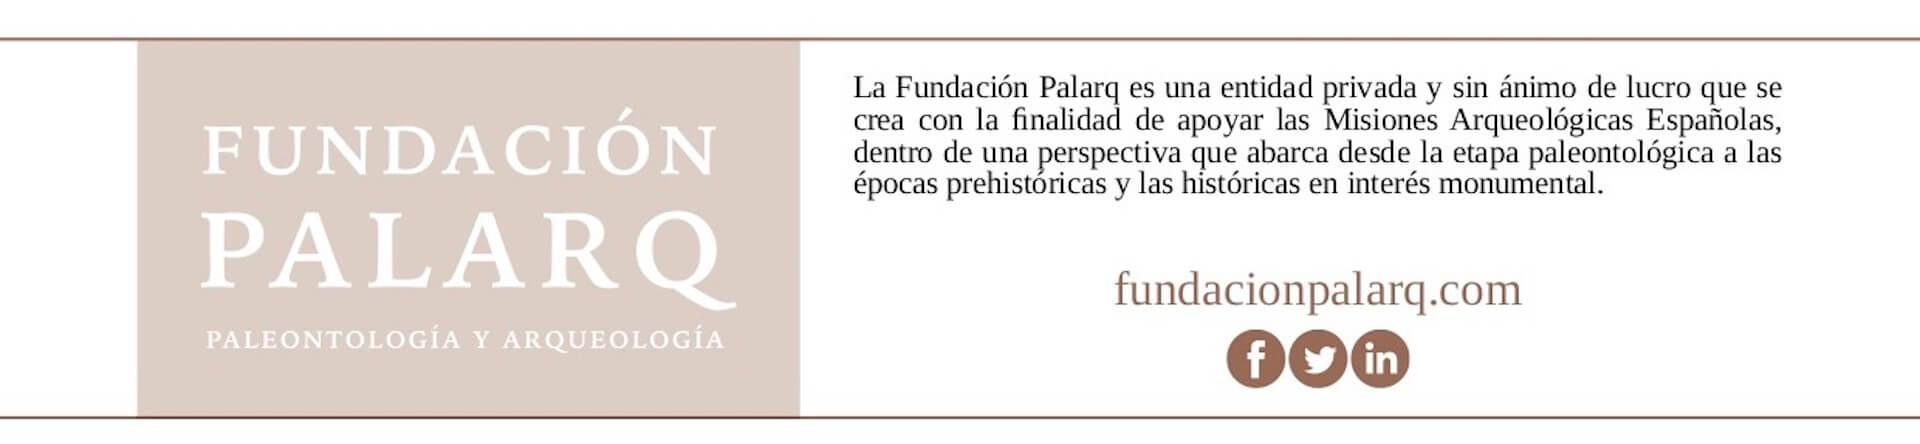 Fundación Palarq